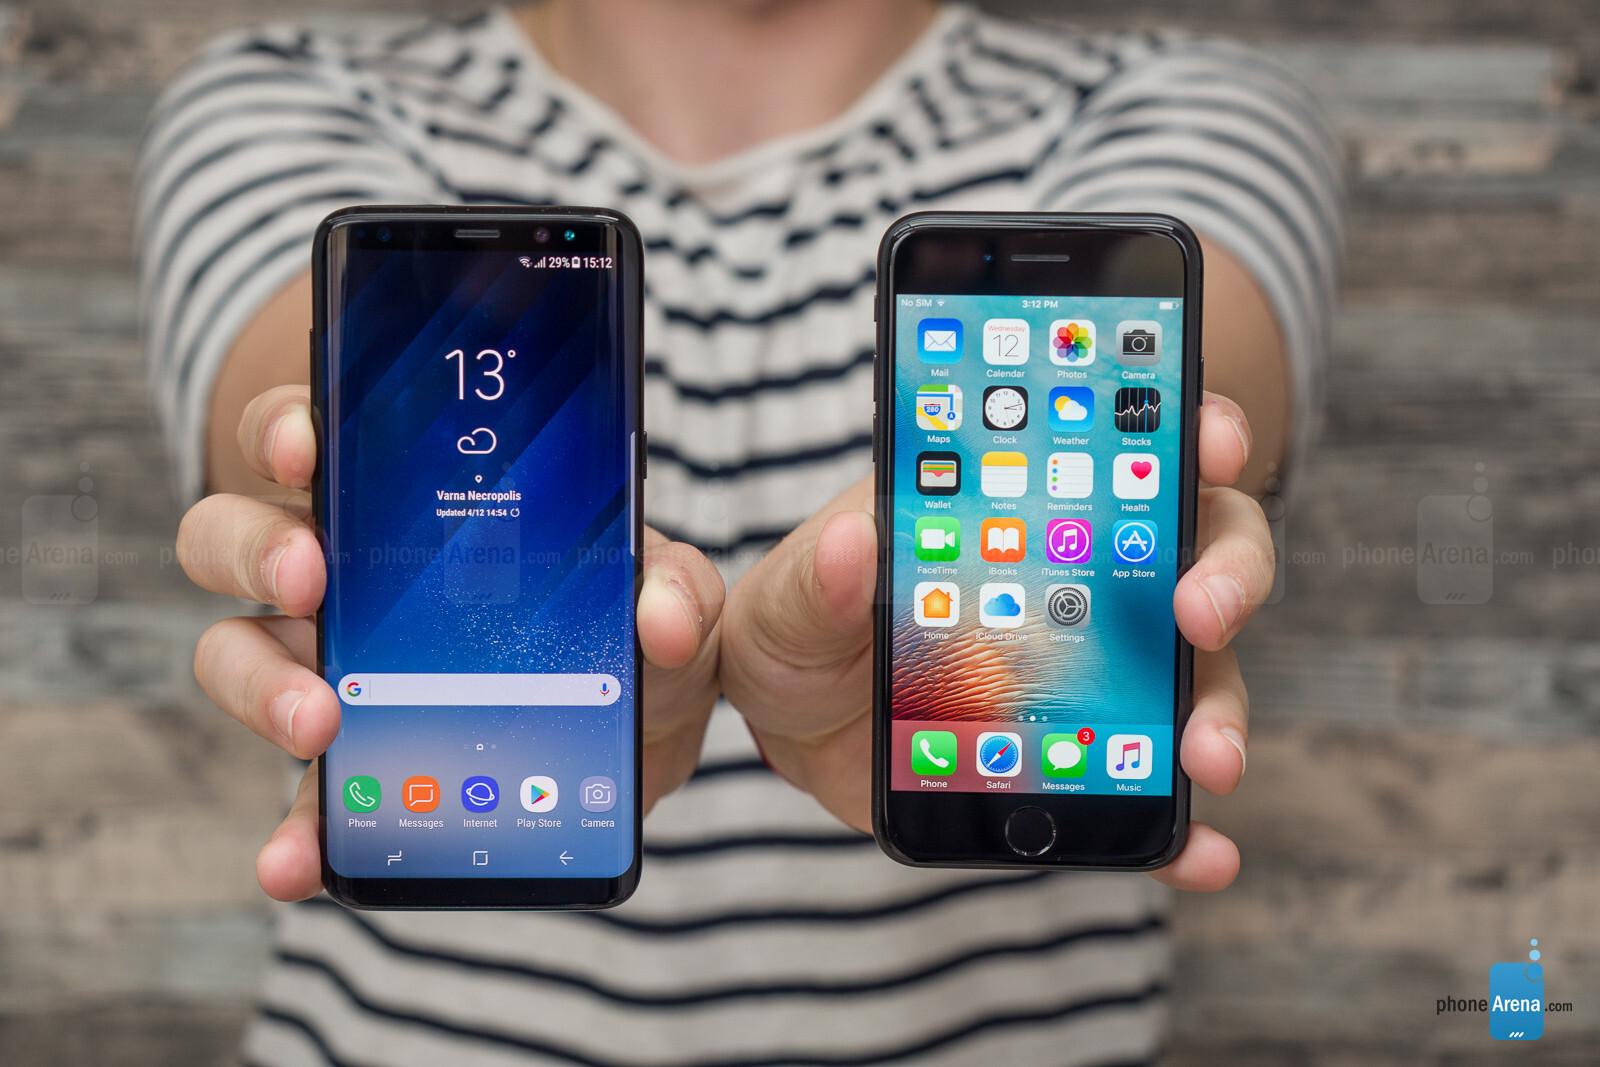 Iphone 7 vs samsung galaxy s8 camera